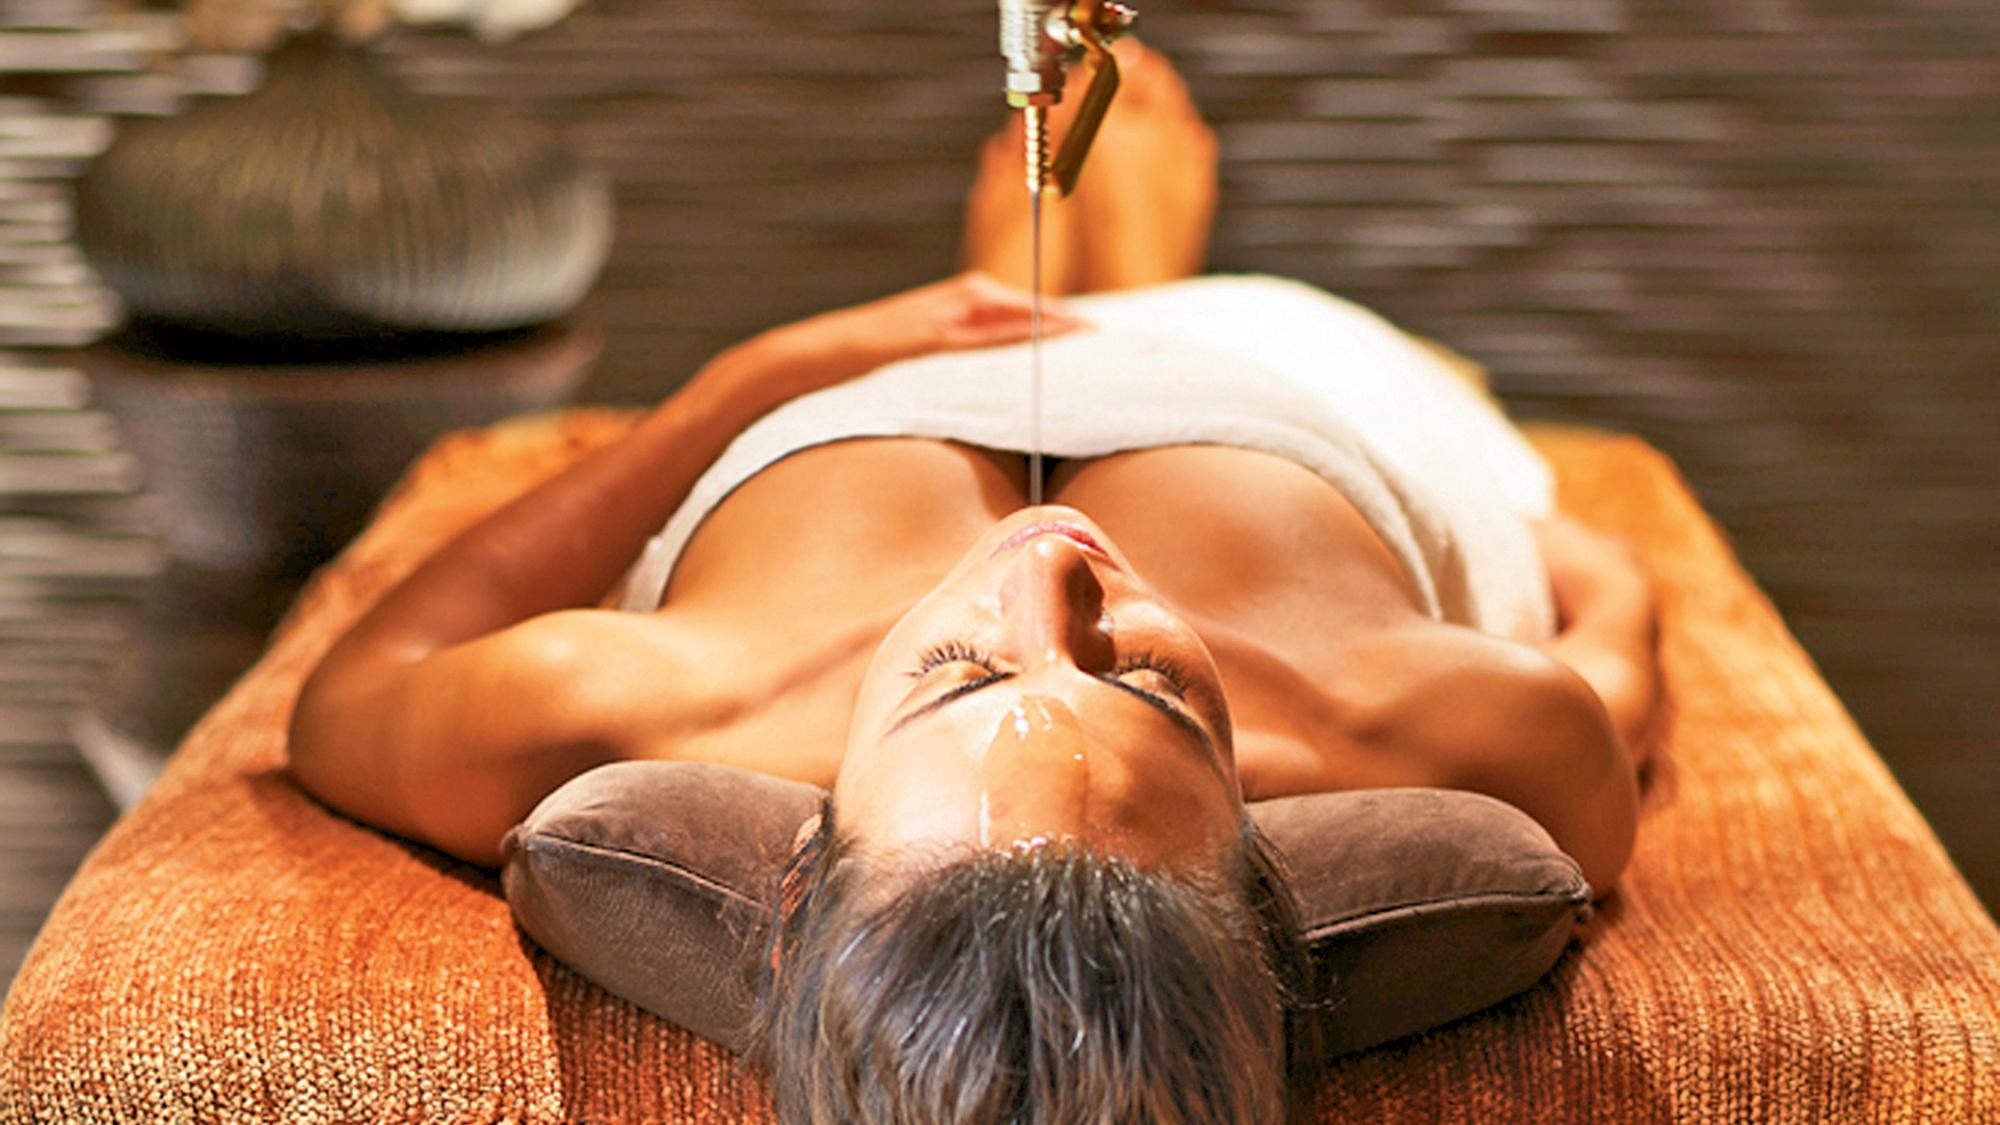 massage randers thai trans escort dk